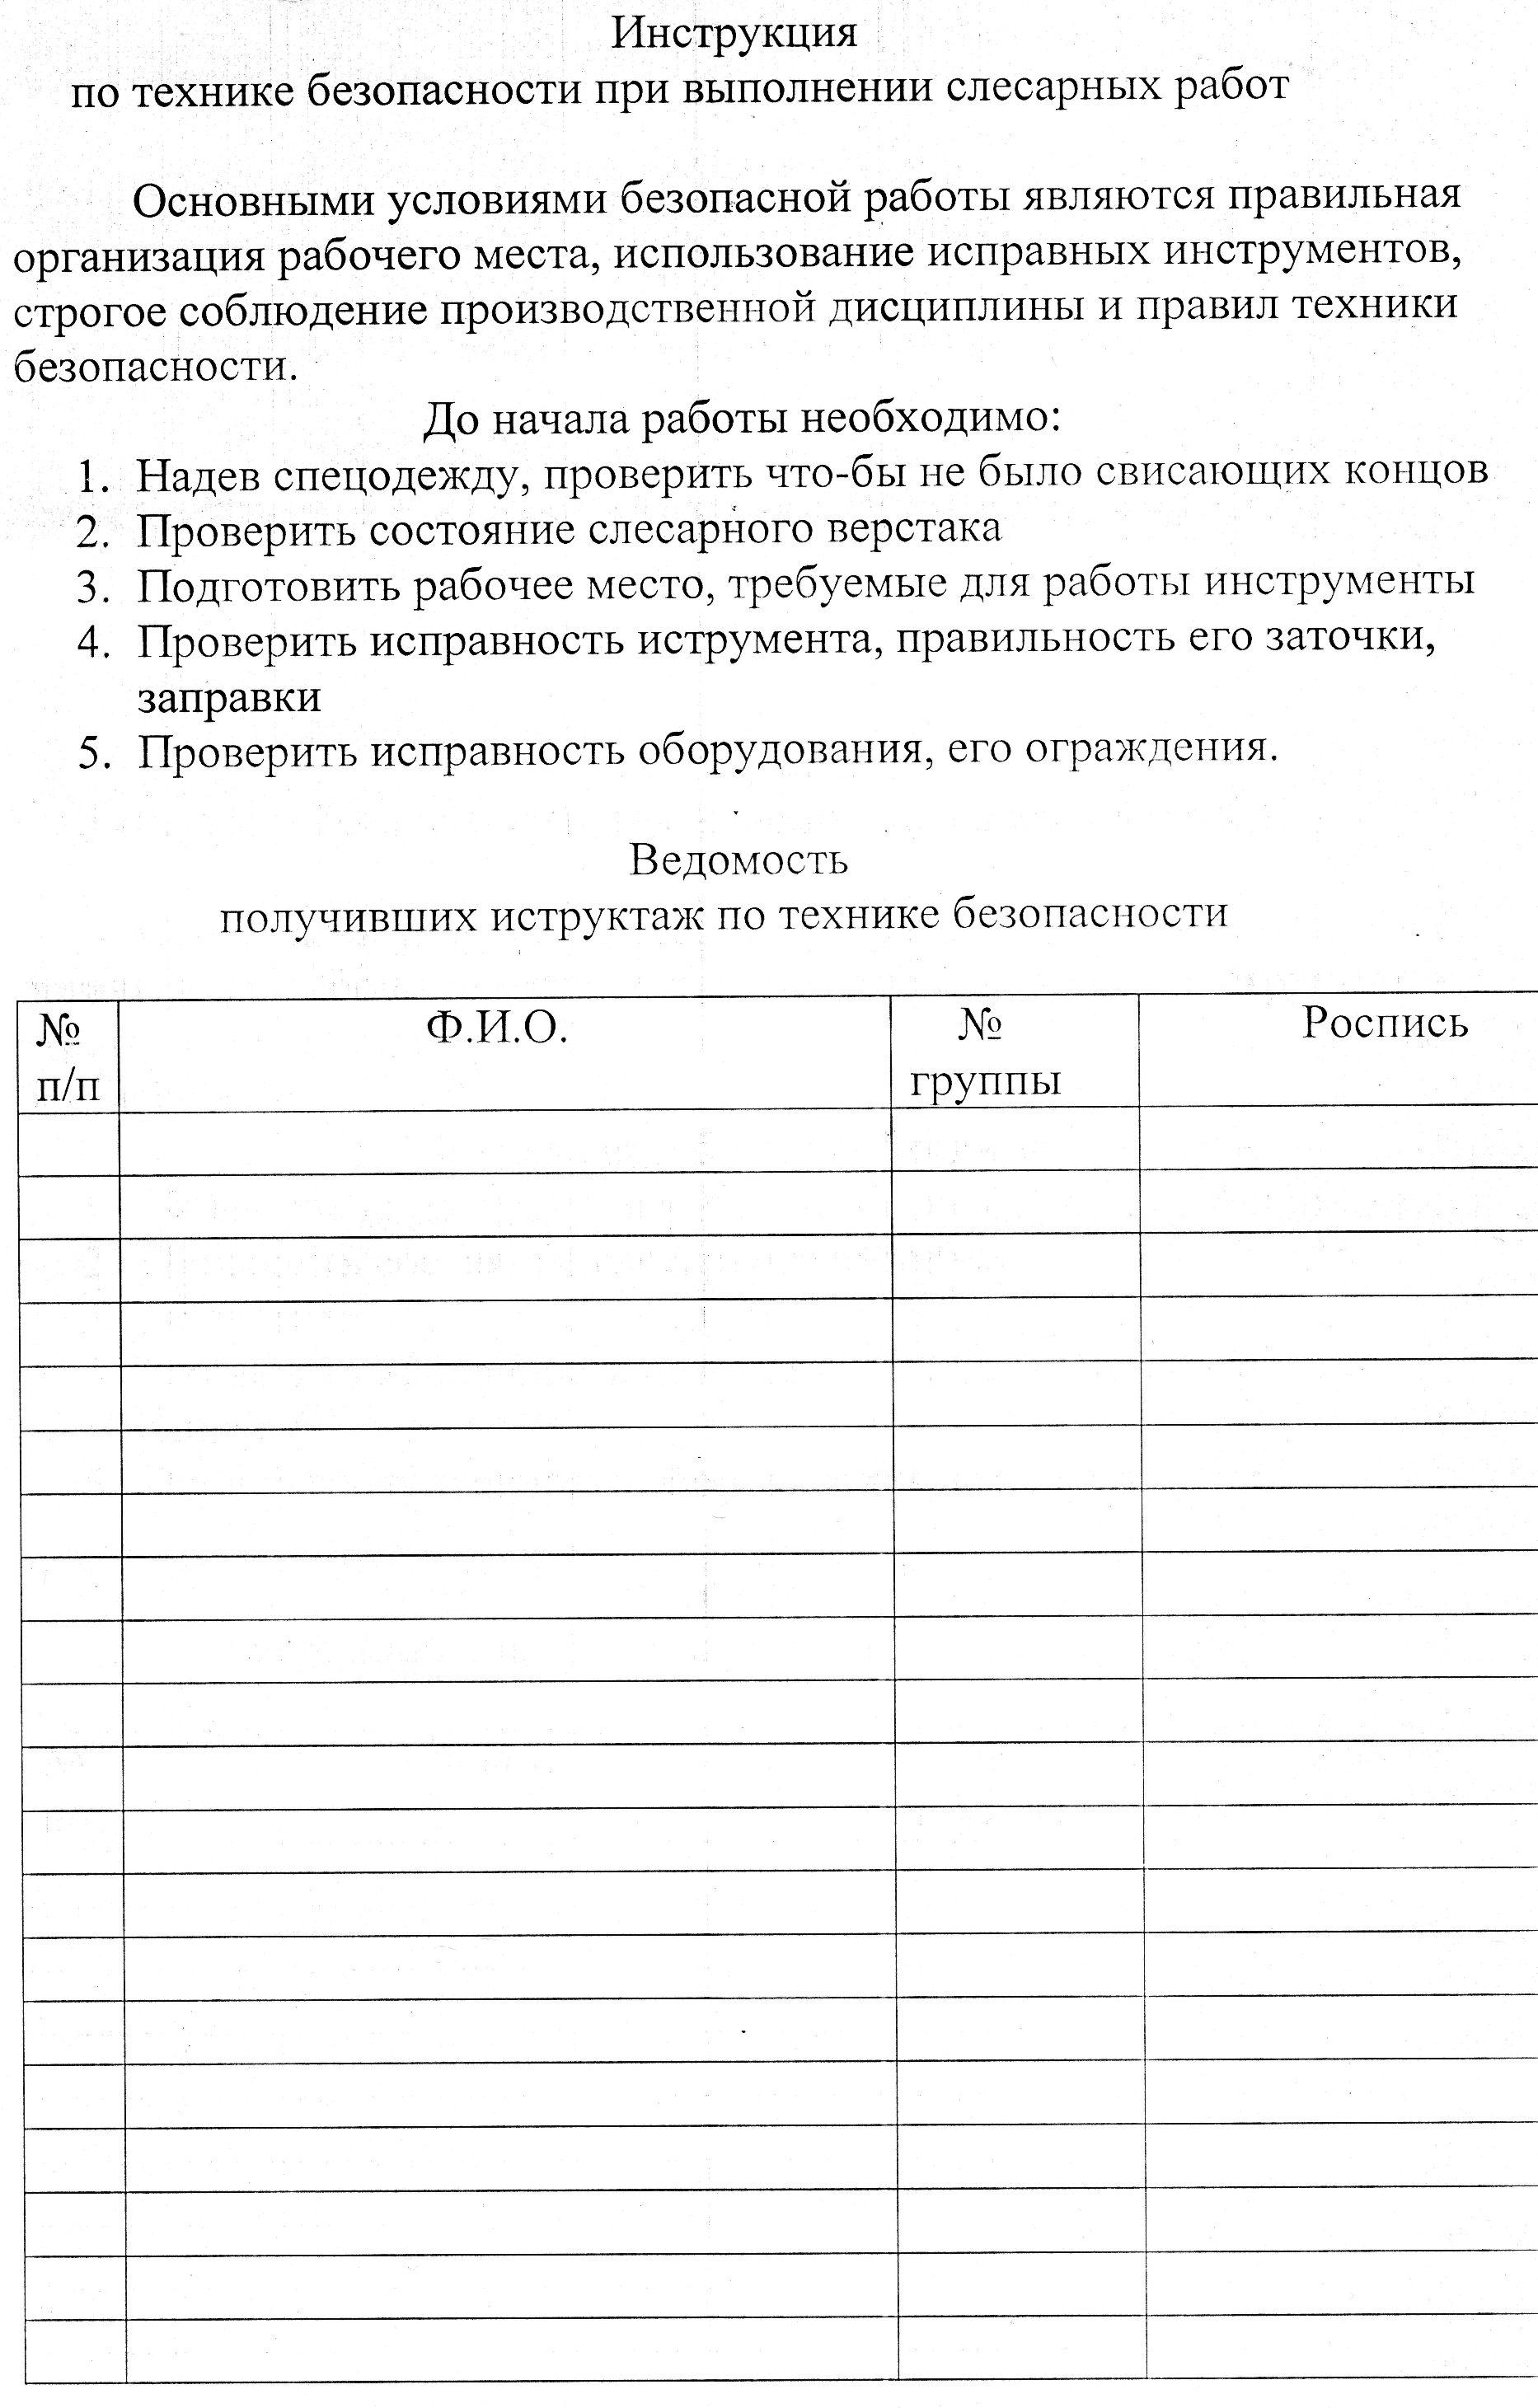 C:\Users\Василий Мельченко\Pictures\img567.jpg